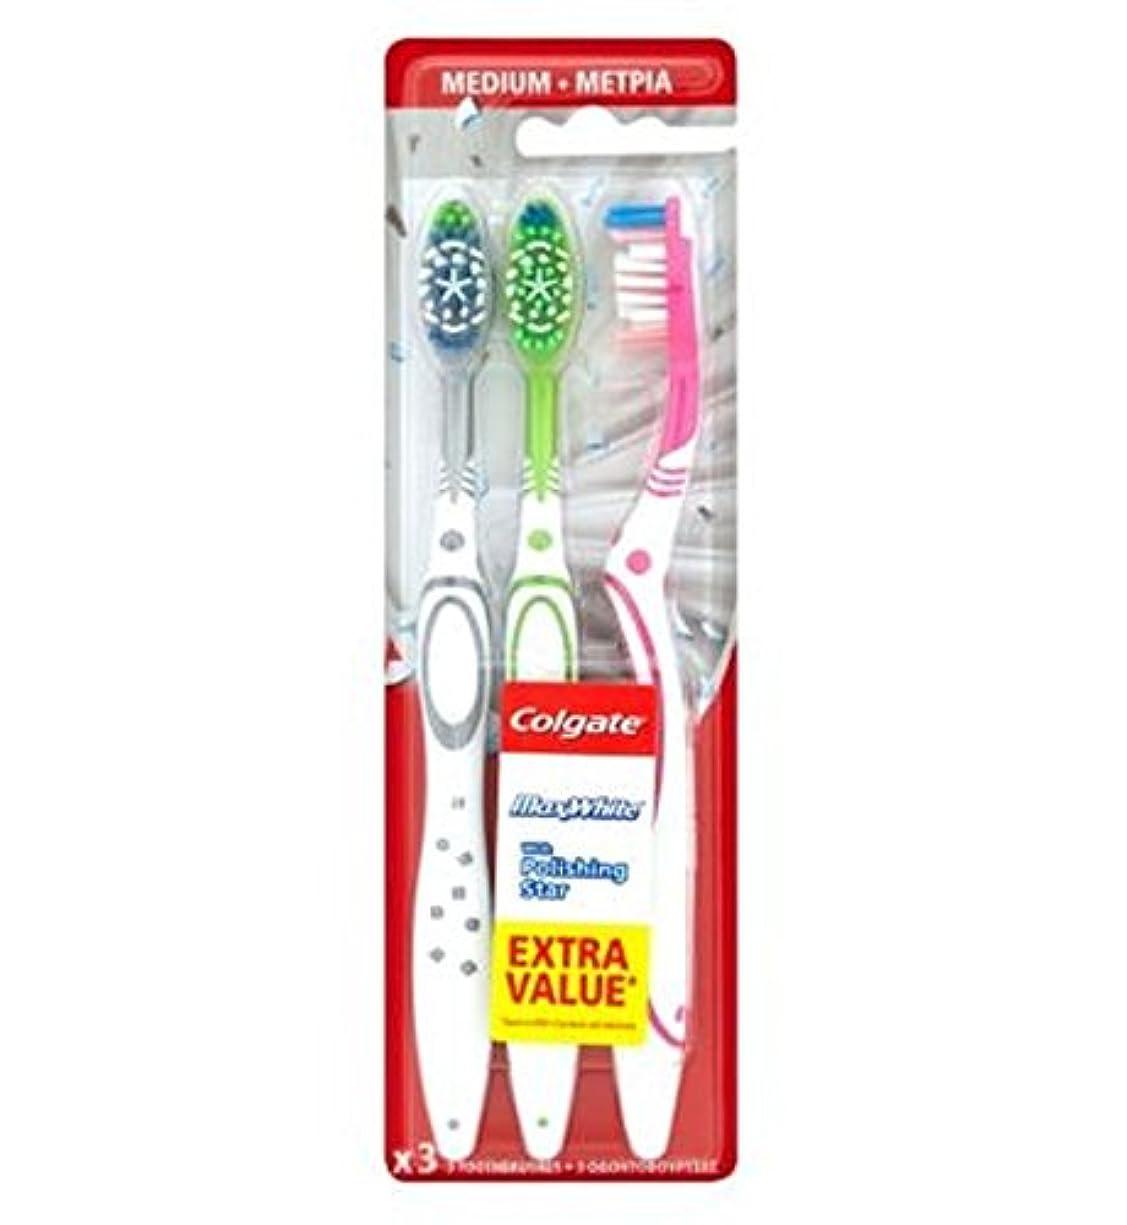 Colgate Max White Triple Pack toothbrush - コルゲートマックスホワイトトリプルパック歯ブラシ (Colgate) [並行輸入品]